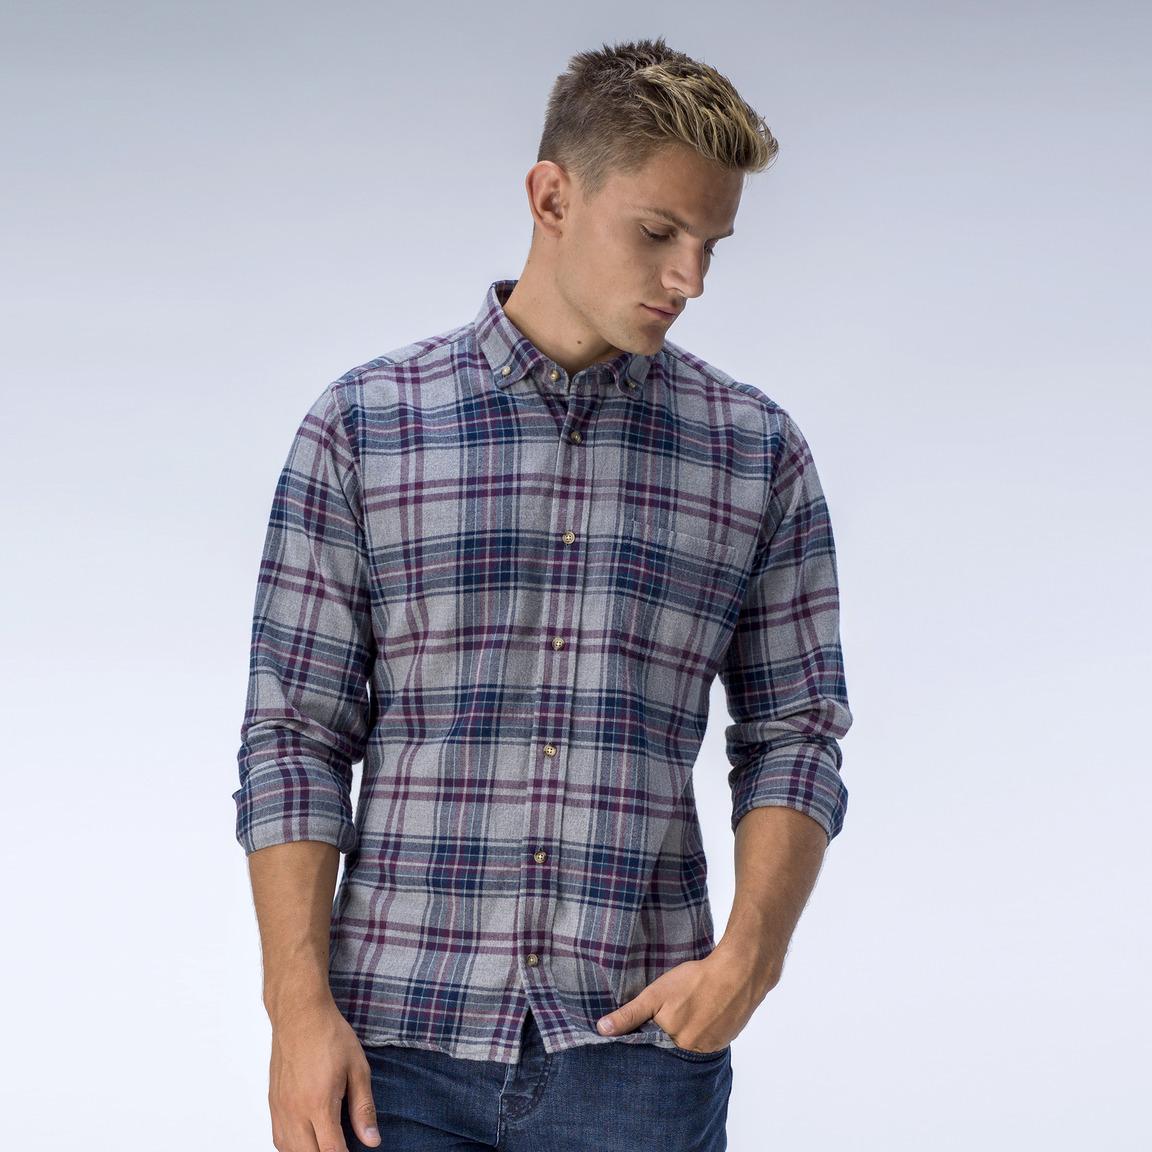 Grey and plum tartan flannel shirt